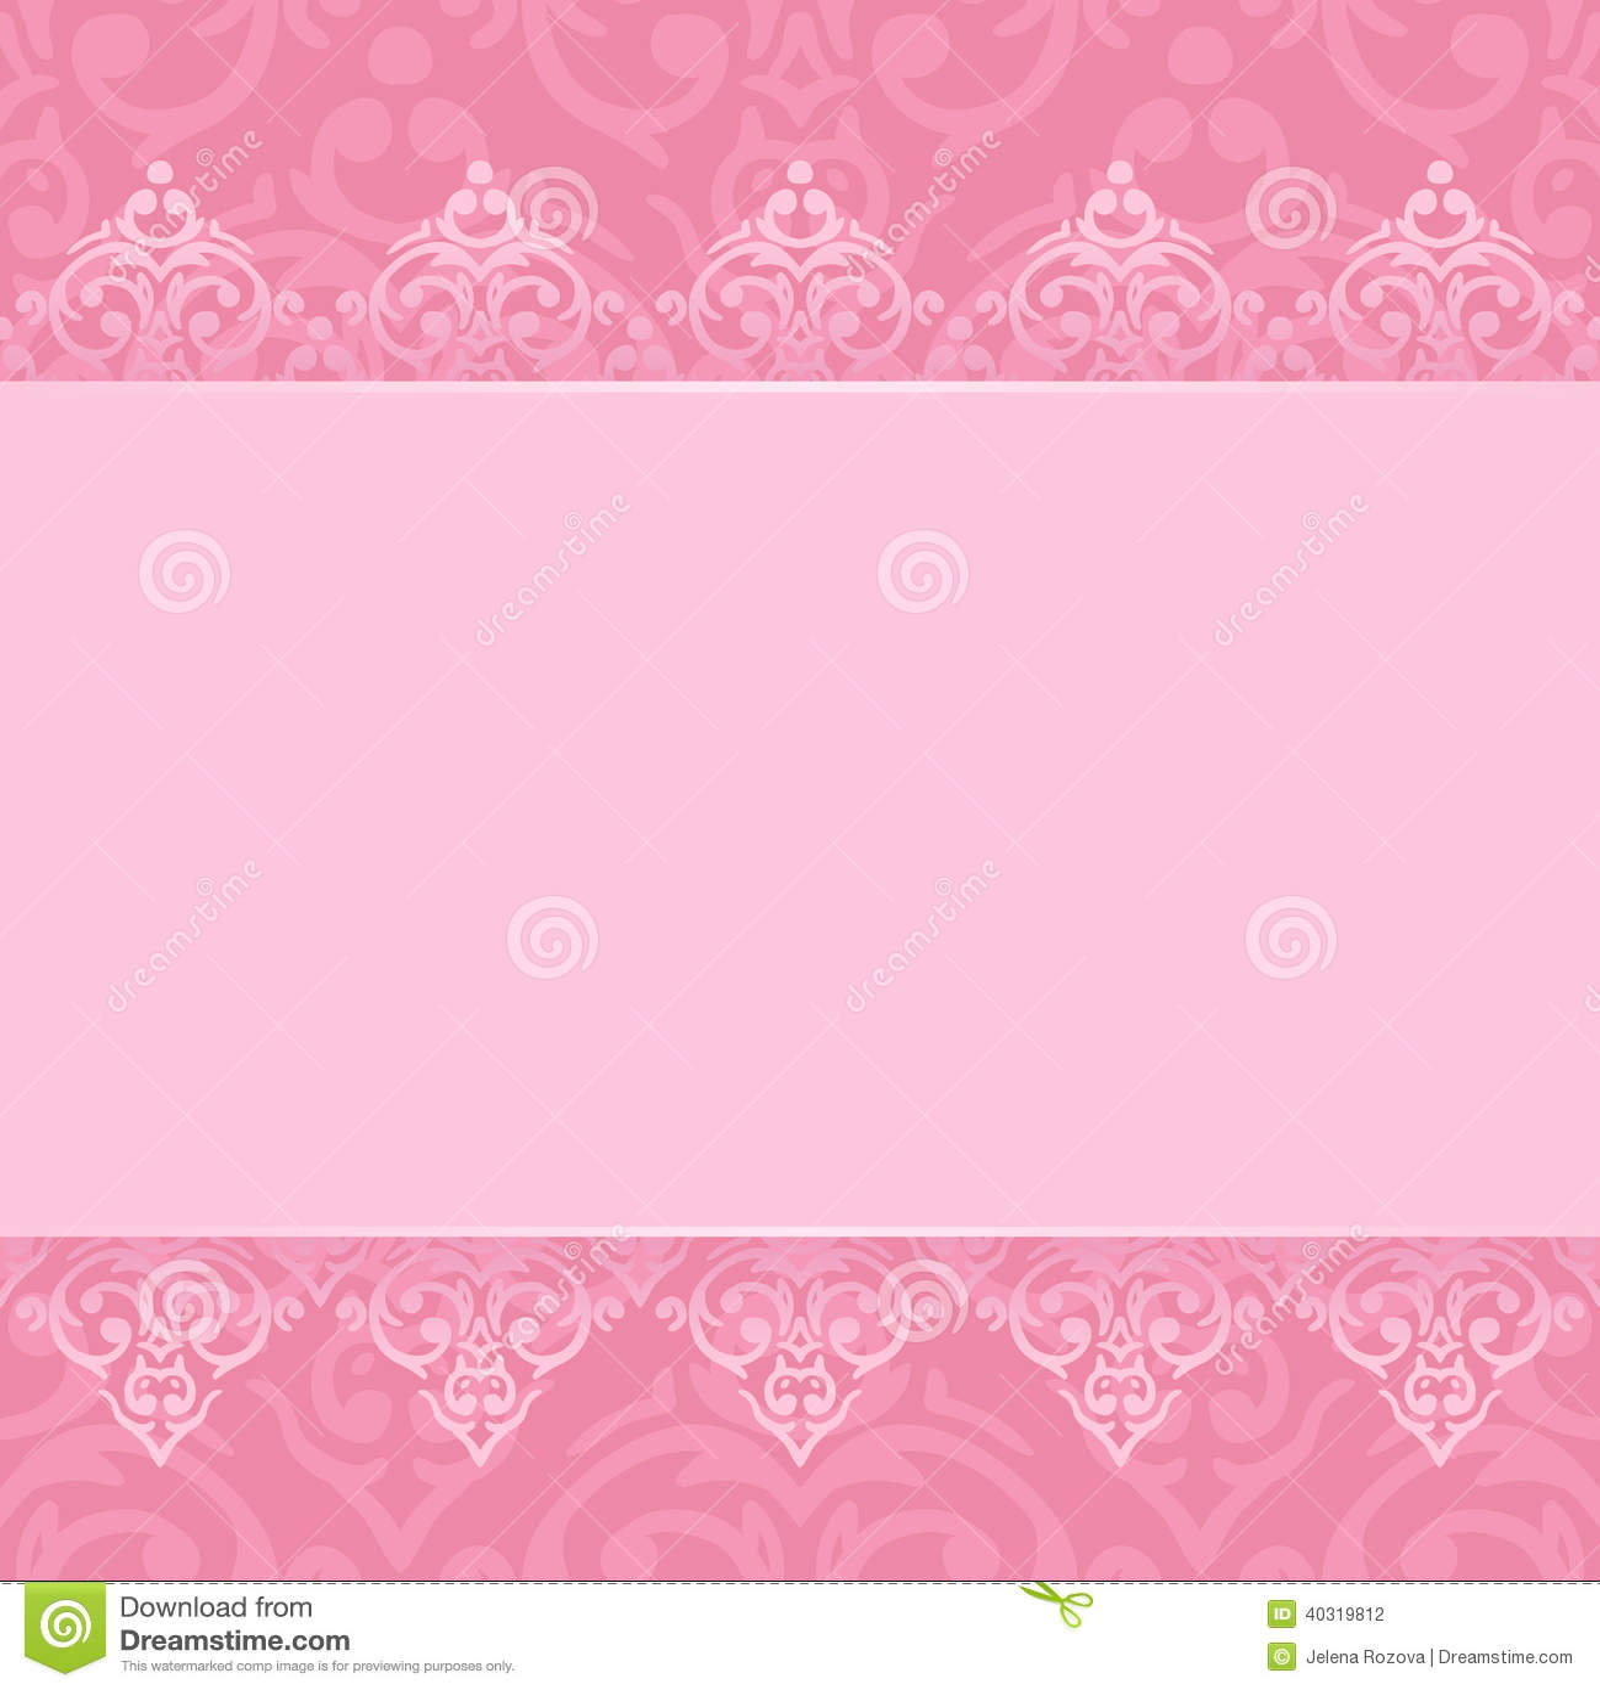 Seamless Pink Frame Border Stock Vector Illustration Of